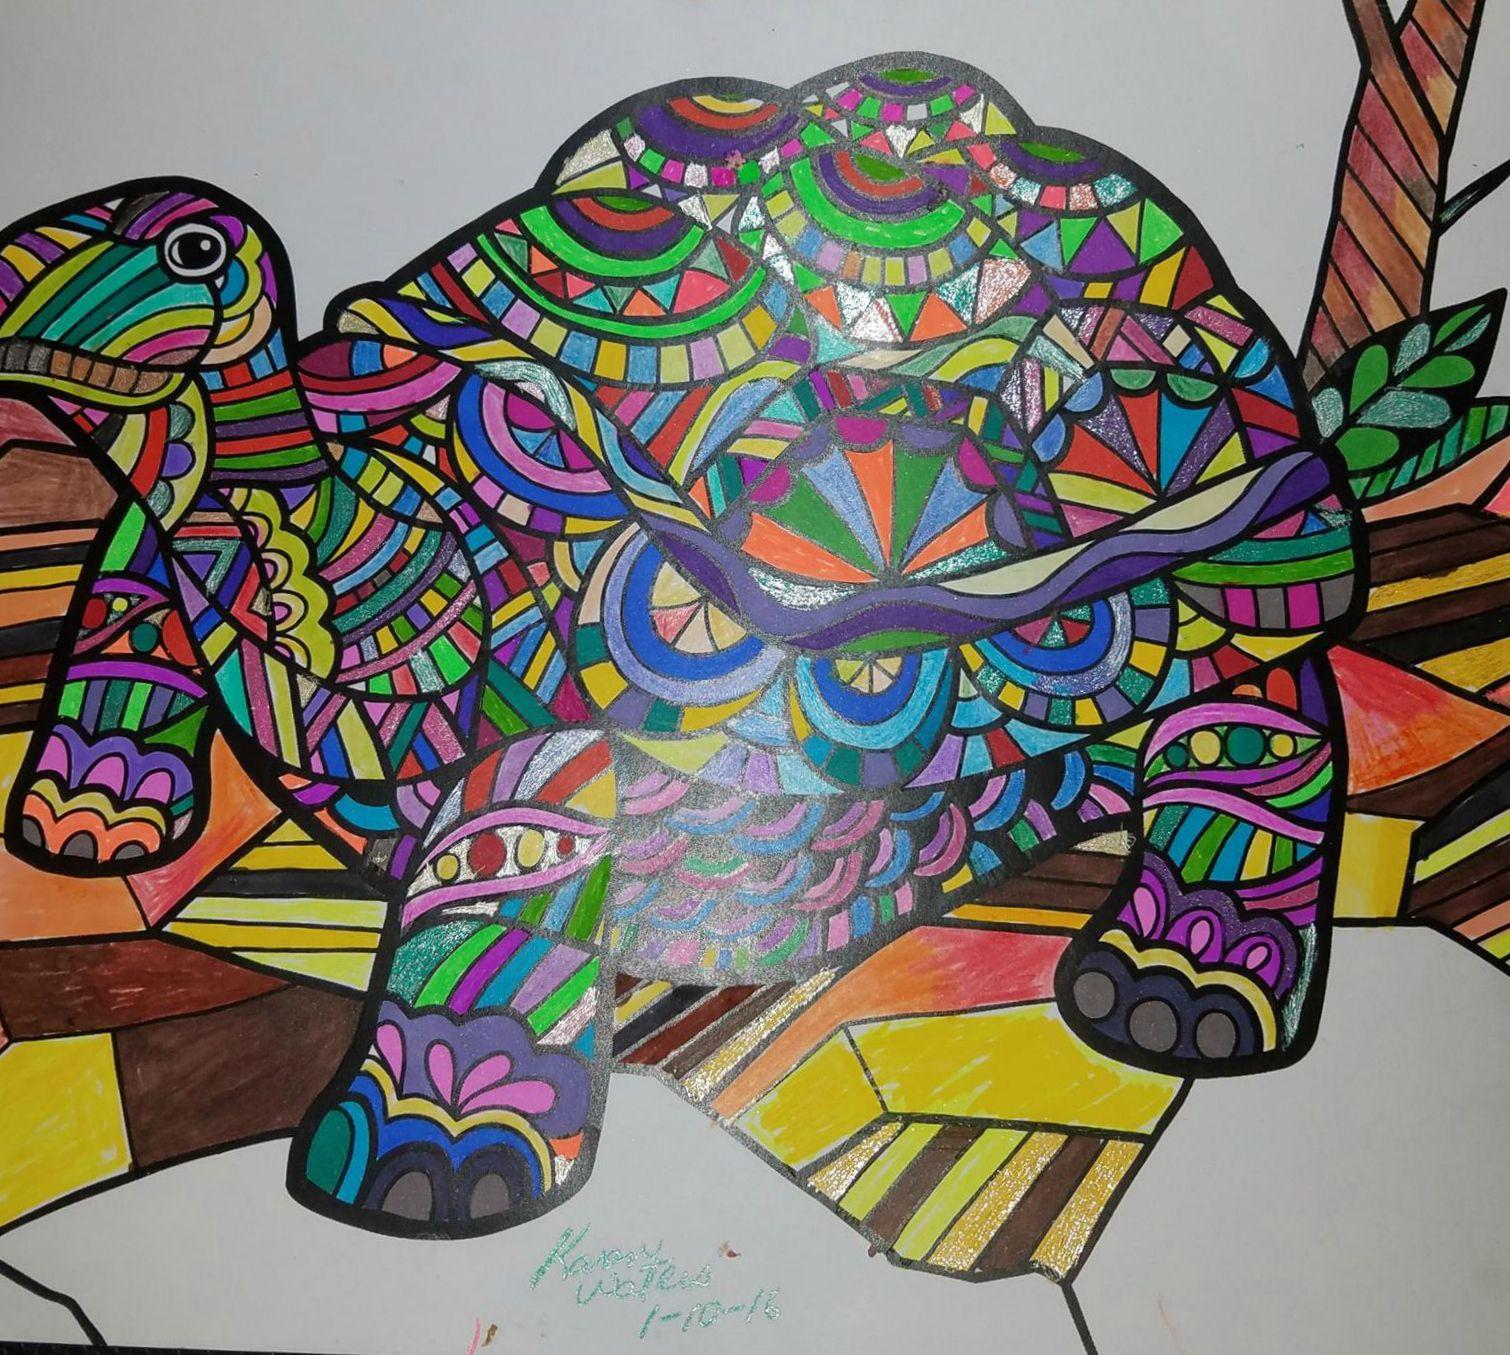 ColorIt Wild Animals Adult Coloring Book Colorist: Karen Waters #adultcoloring #coloringforadults #adultcoloringpages #animalcoloringpages